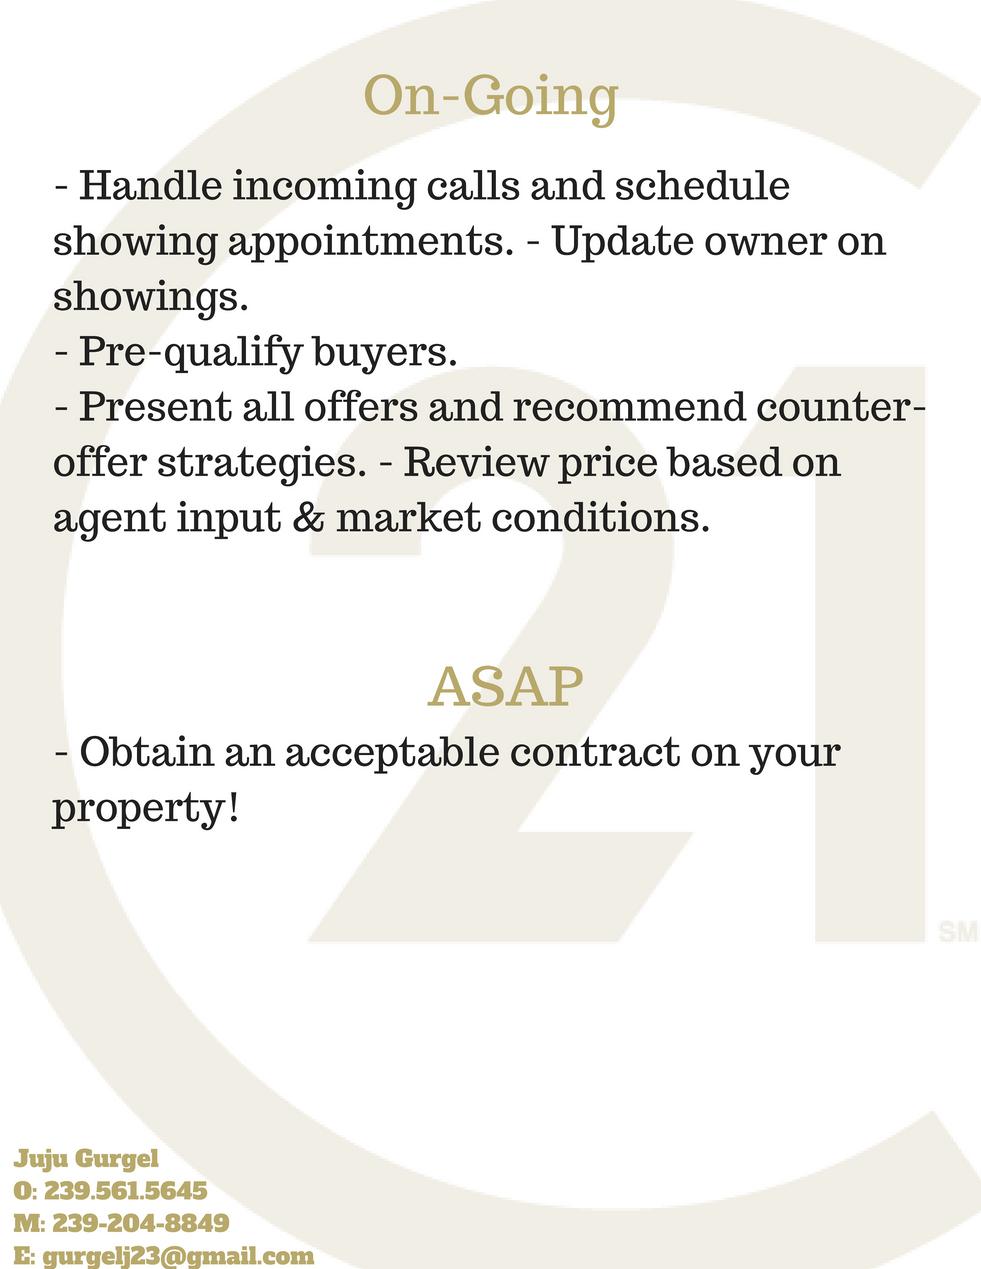 Marketing Plan of Action